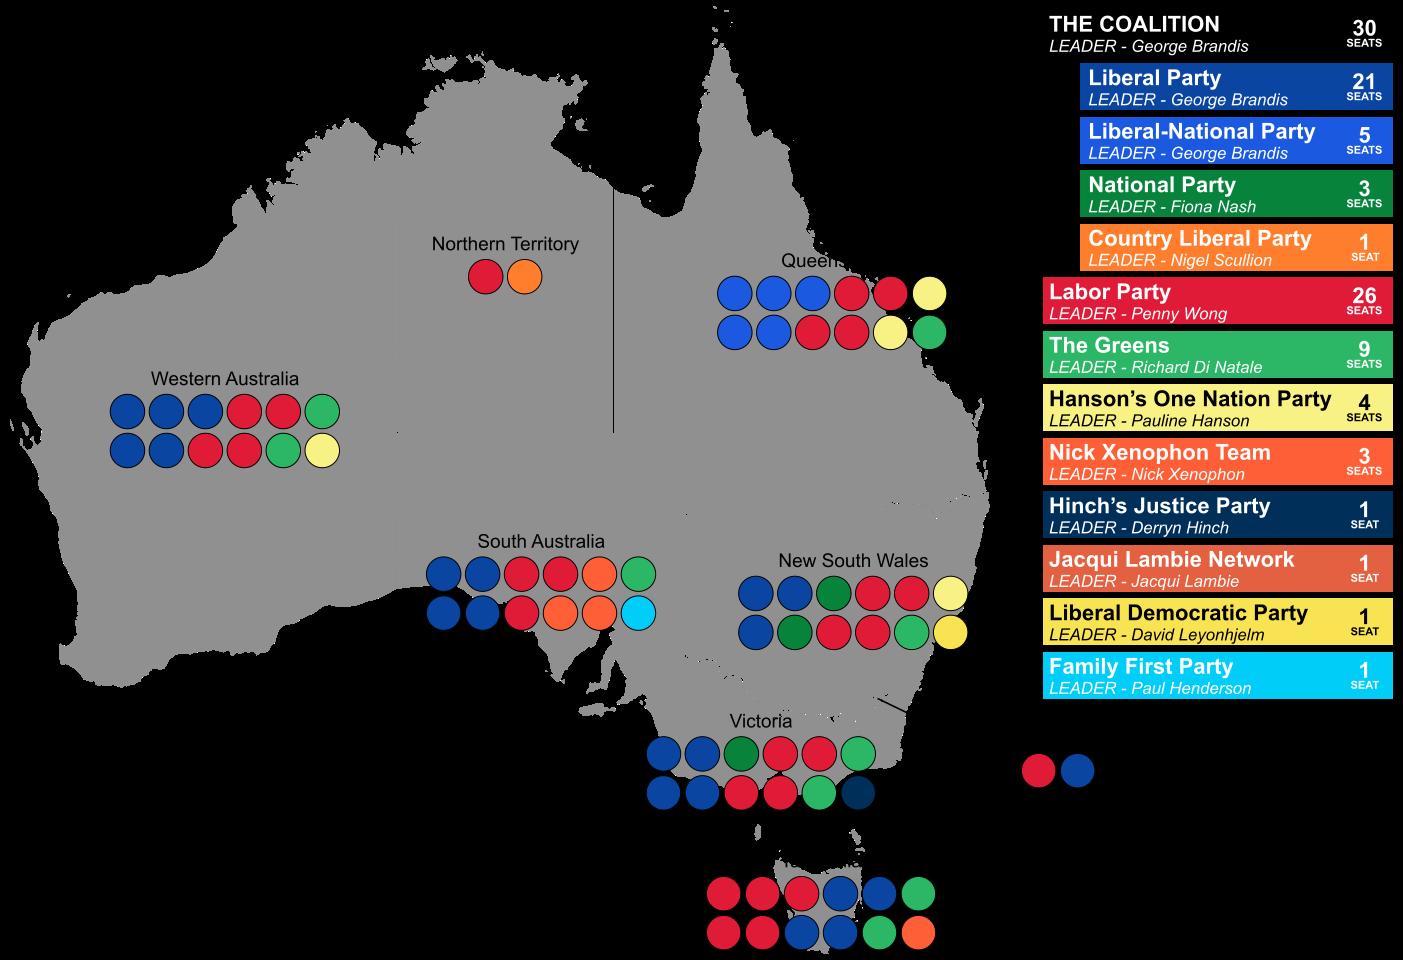 Map Of Australia 2016.Australia Senate Election 2016 Map Maps Of Australia Australasia